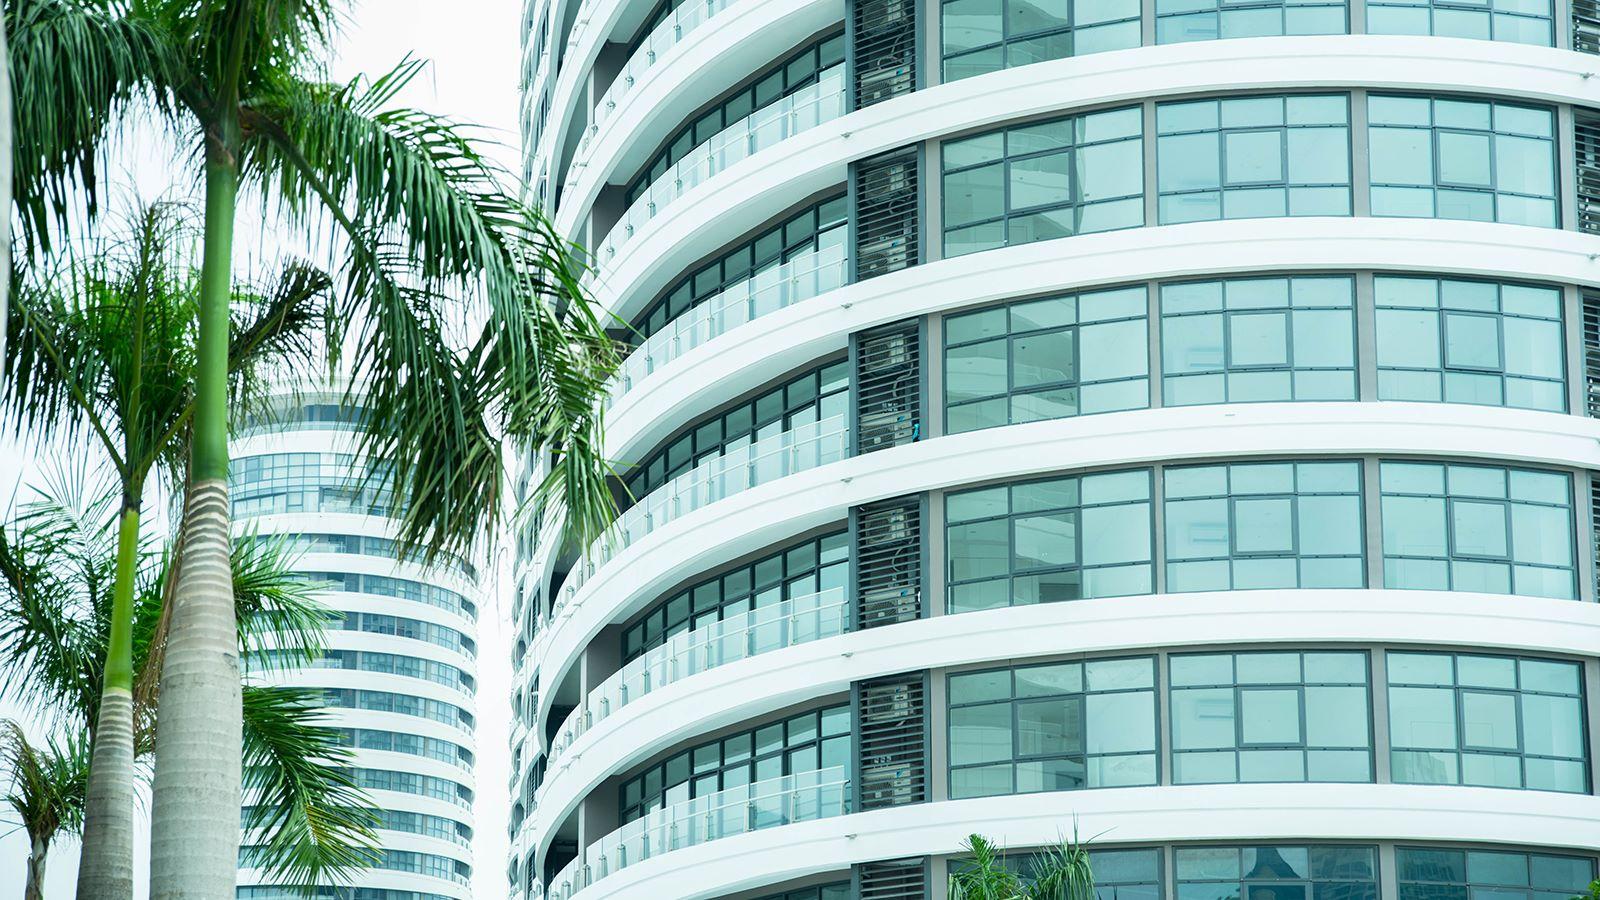 City Garden Building - Mace Group